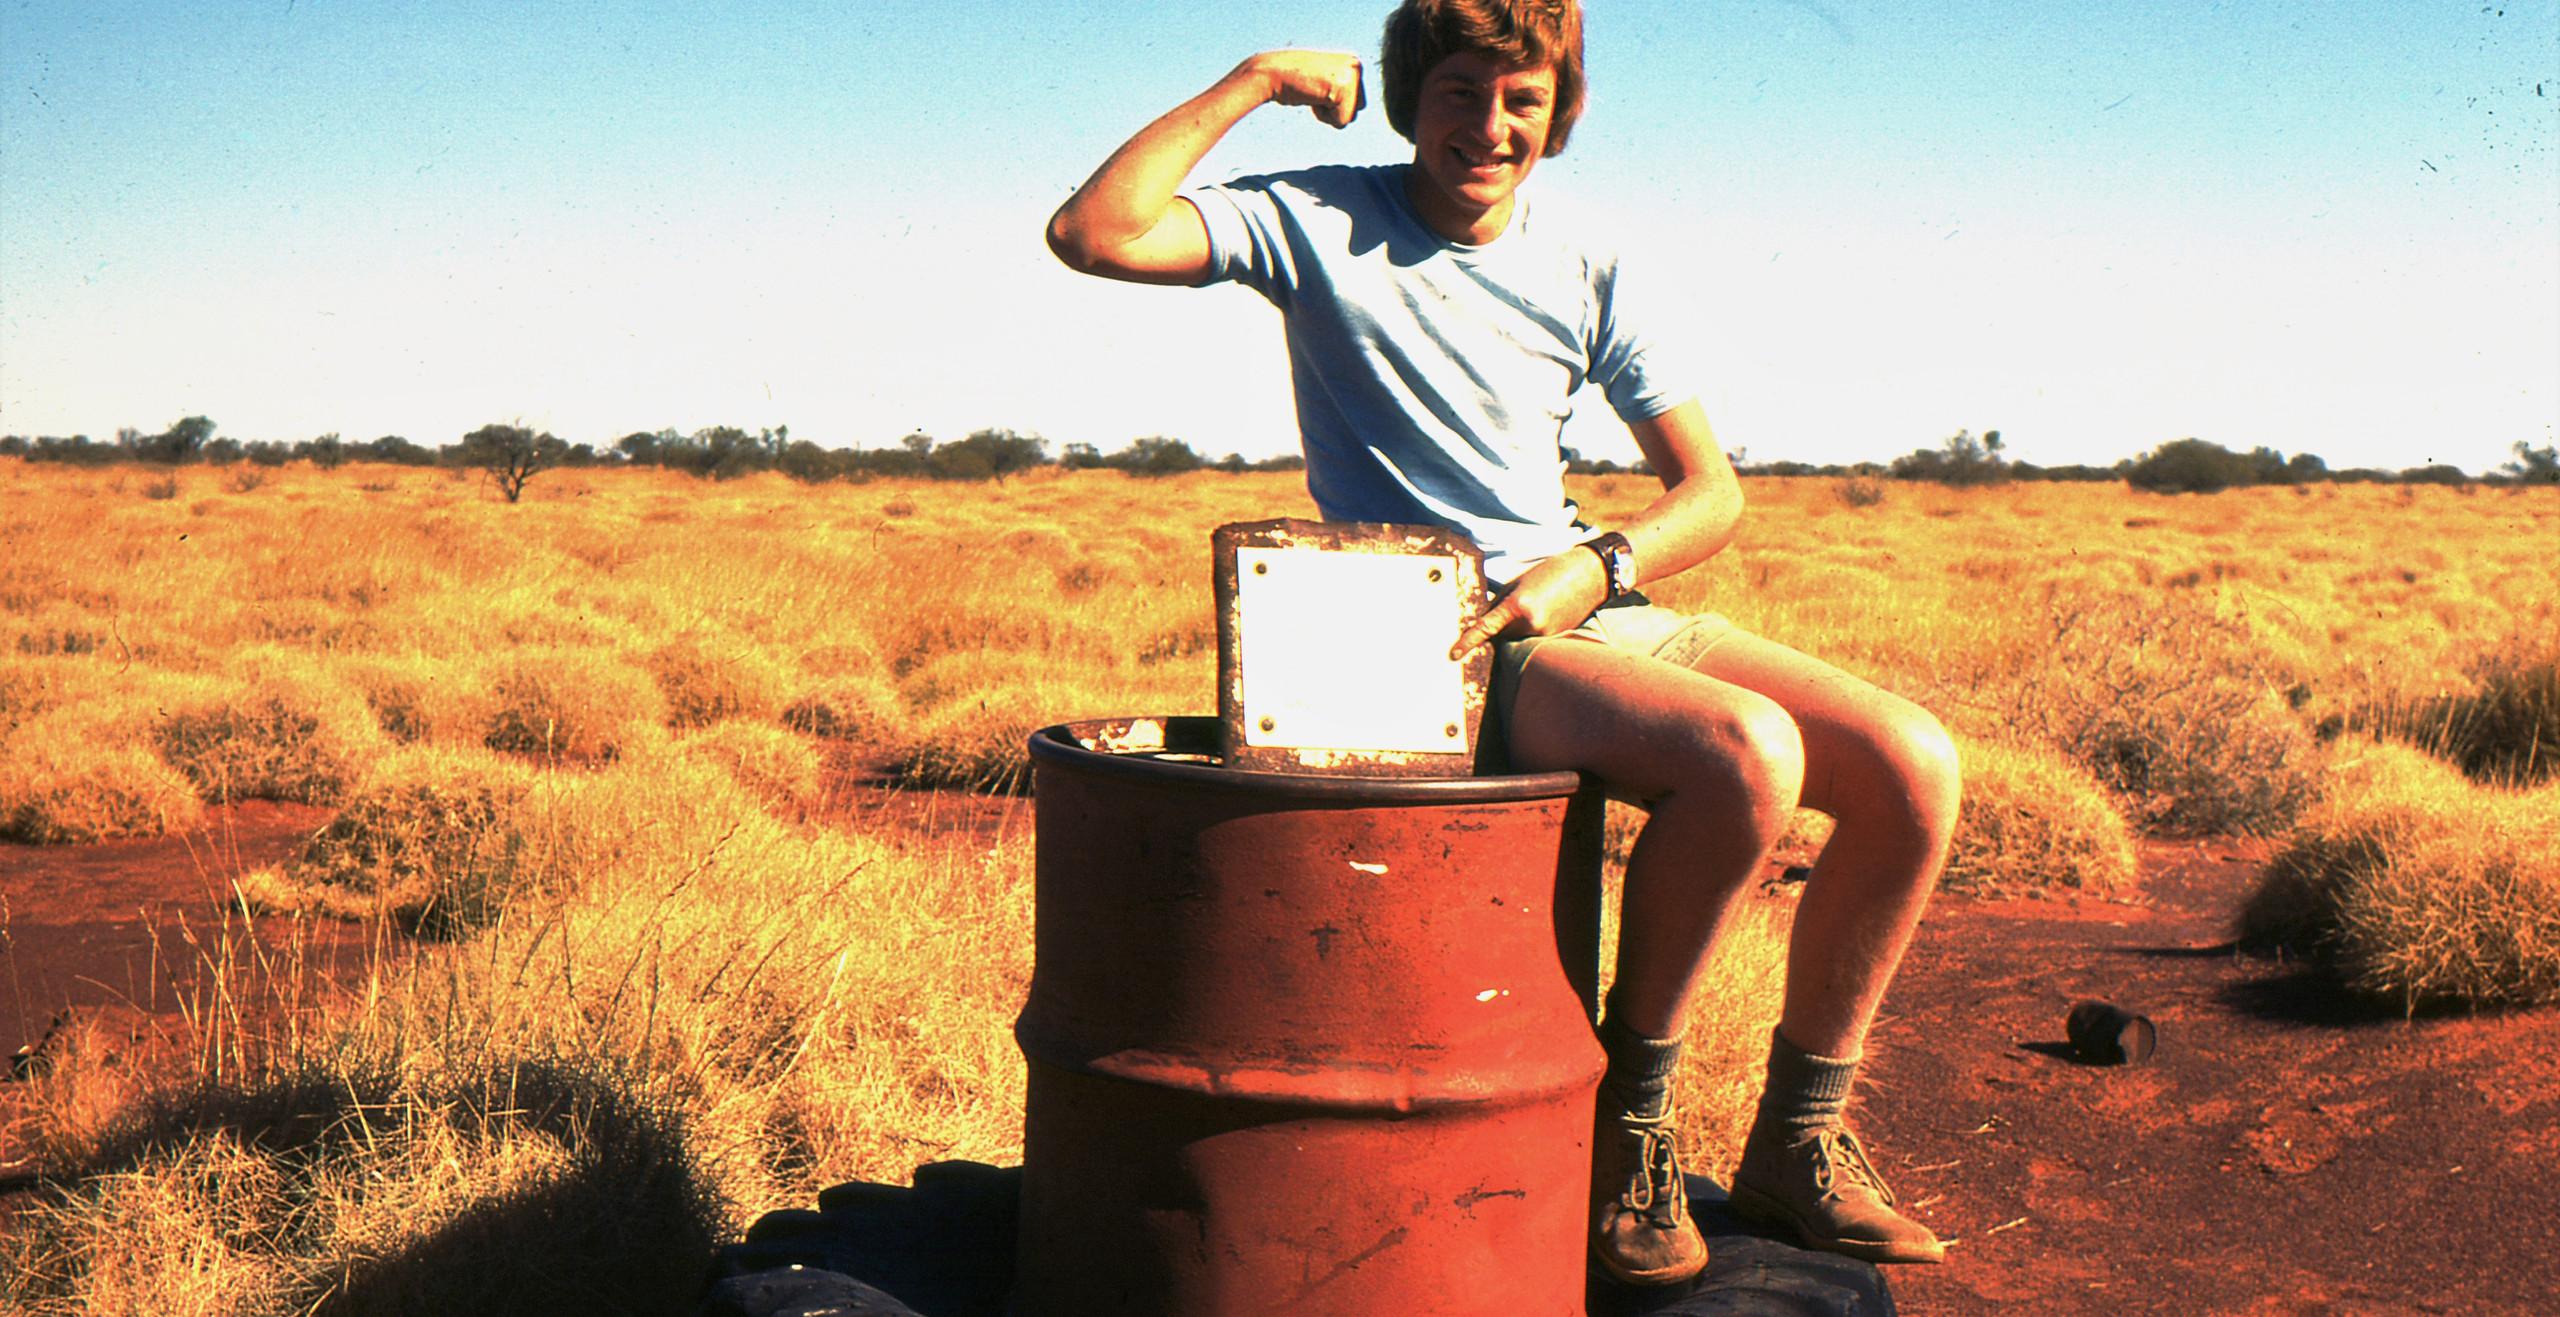 Gary Beadell at Everard Junction in 1977, photo by Len Beadell